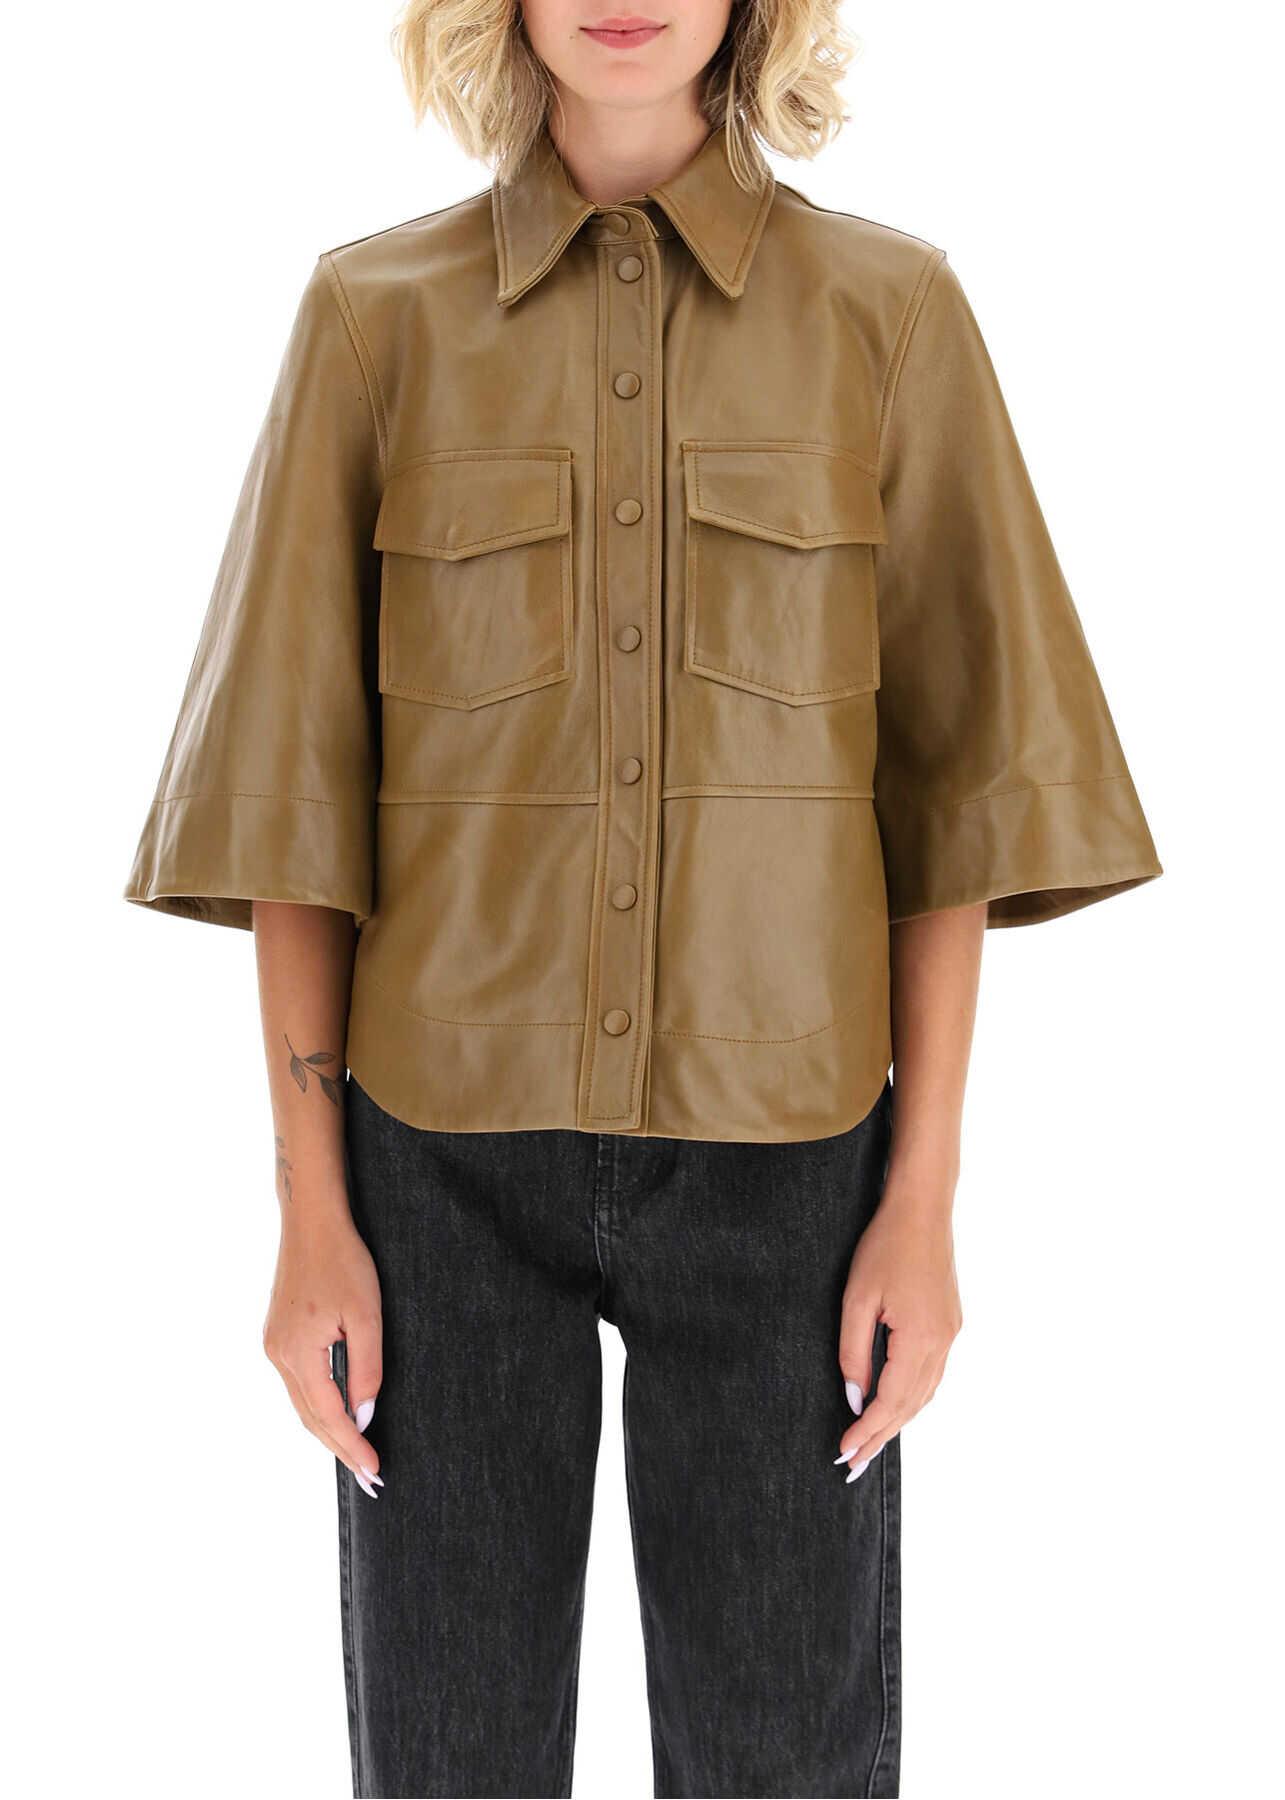 Ganni Leather Shirt F4945 TIGERS EYE image0